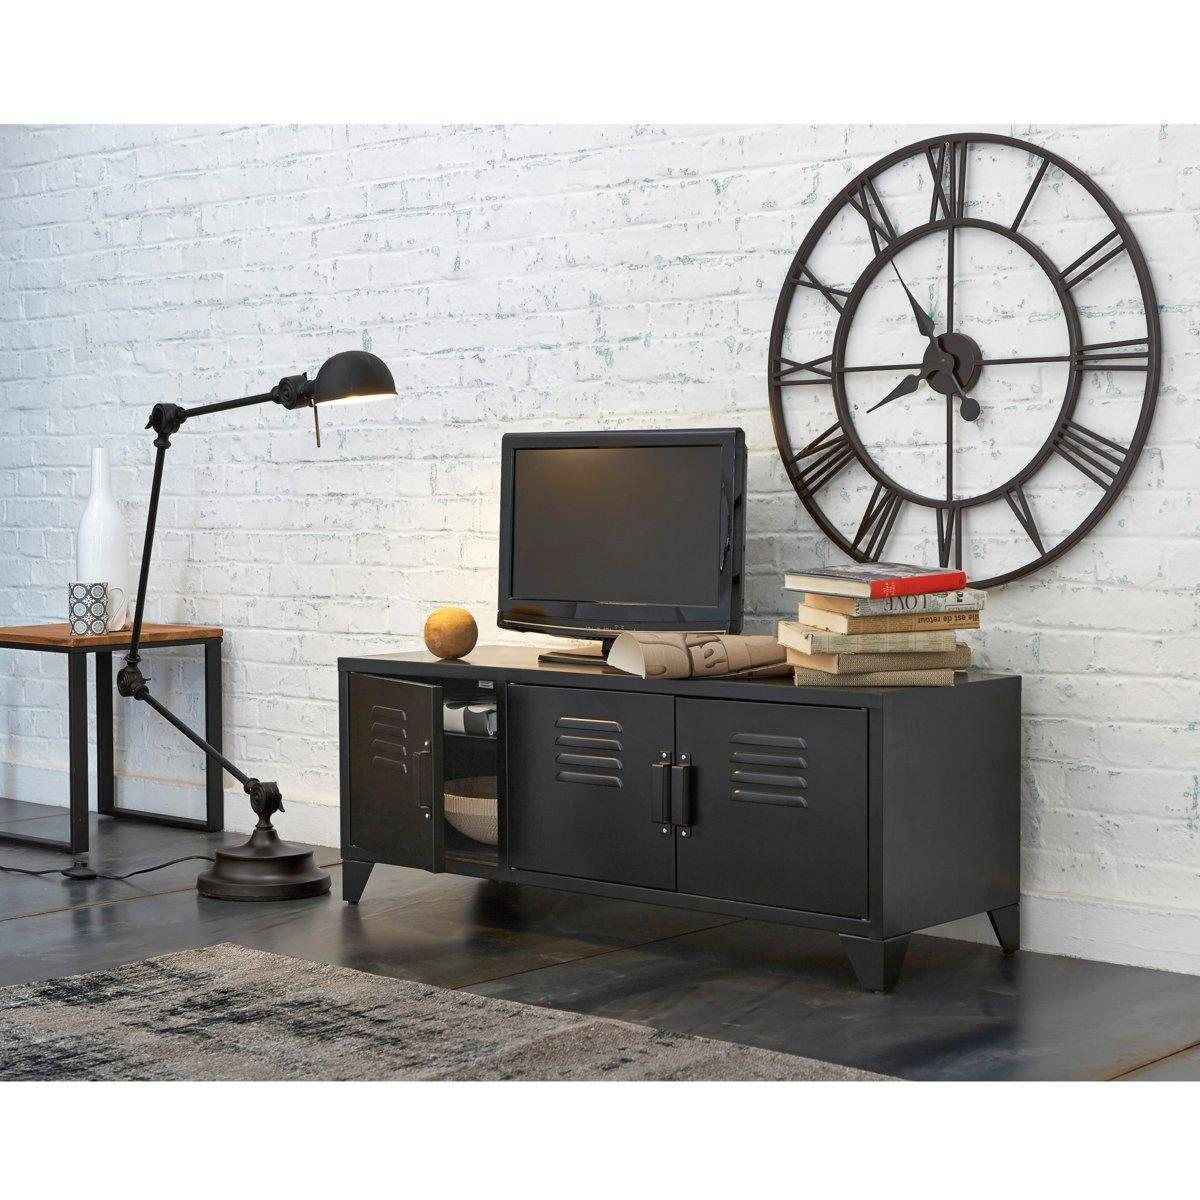 meuble tv acier style indus 3 portes hiba la redoute interieurs la redoute mi casa. Black Bedroom Furniture Sets. Home Design Ideas